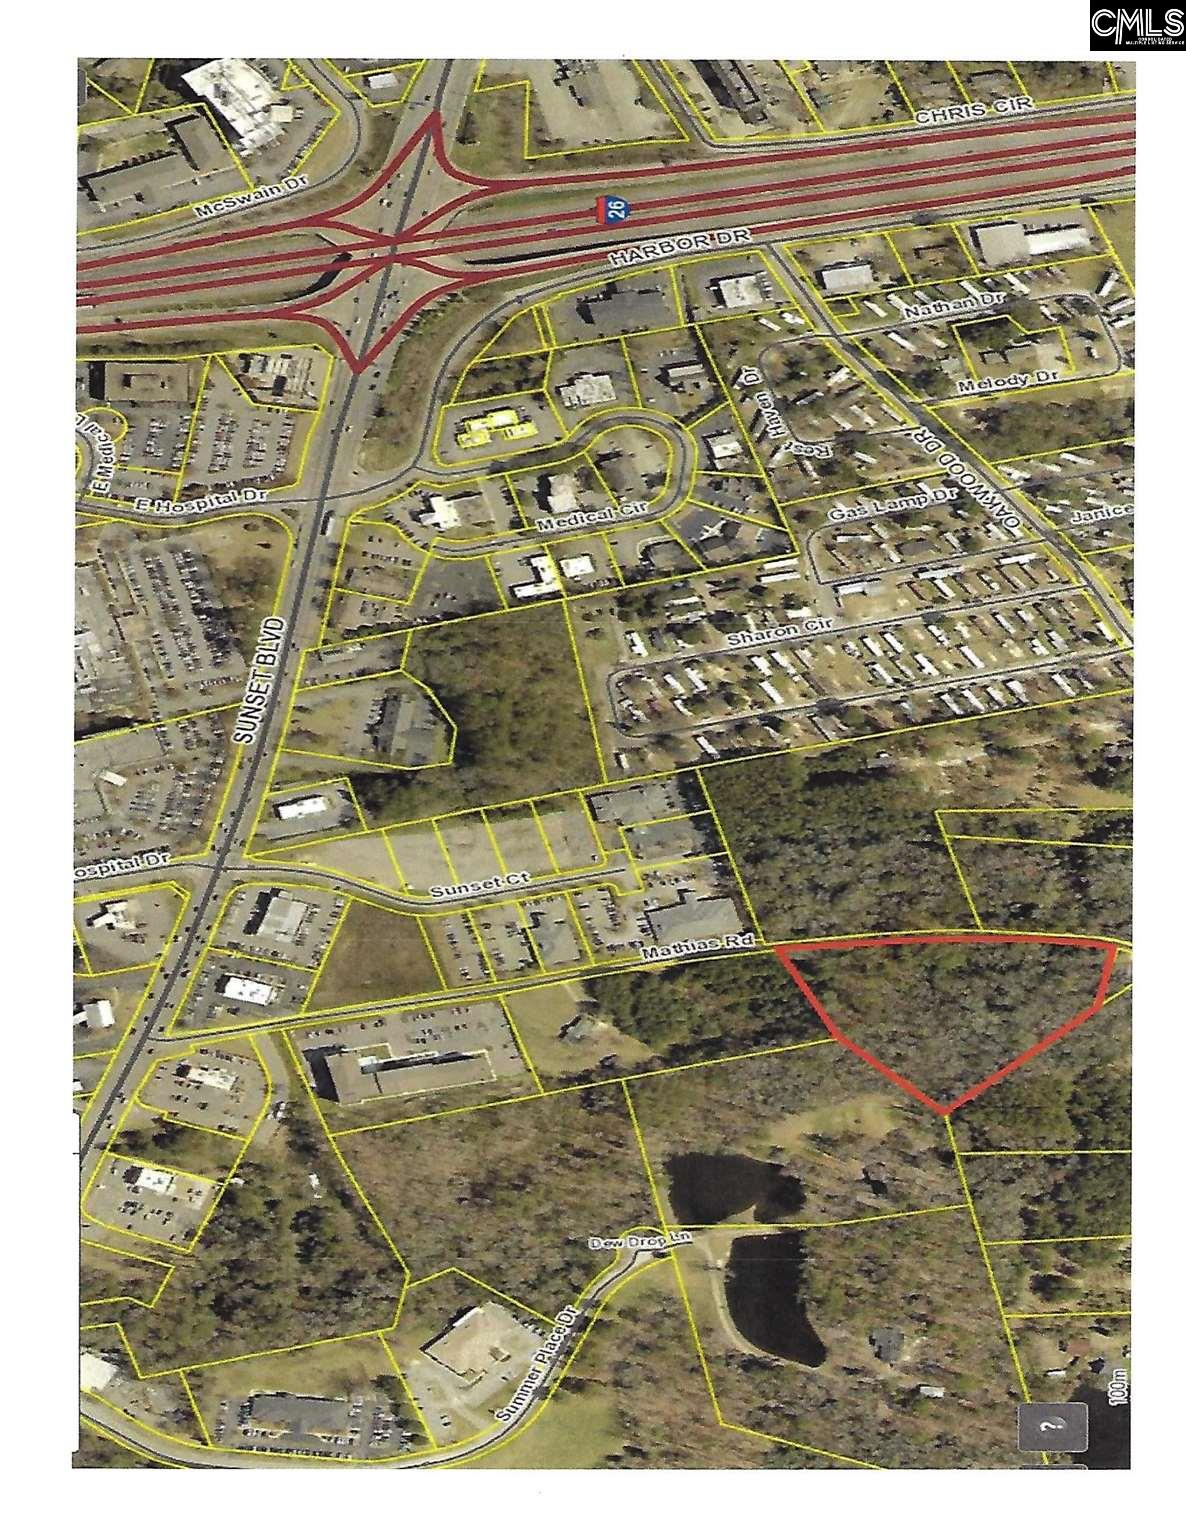 Mathias Road West Columbia, SC 29169-9999